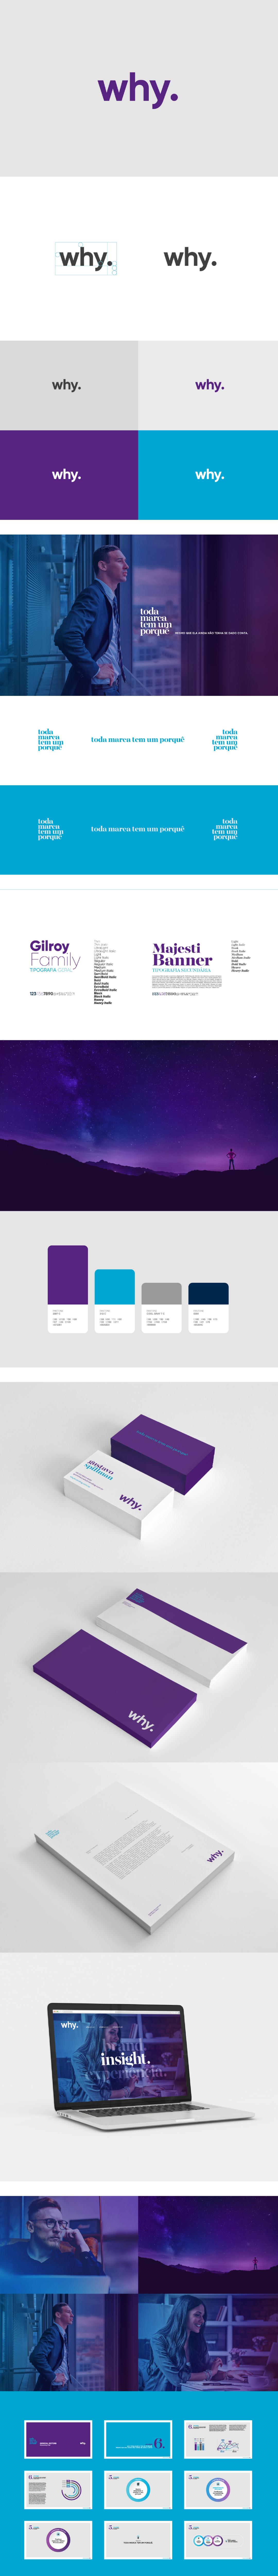 Branding,Art Direction,Graphic Design